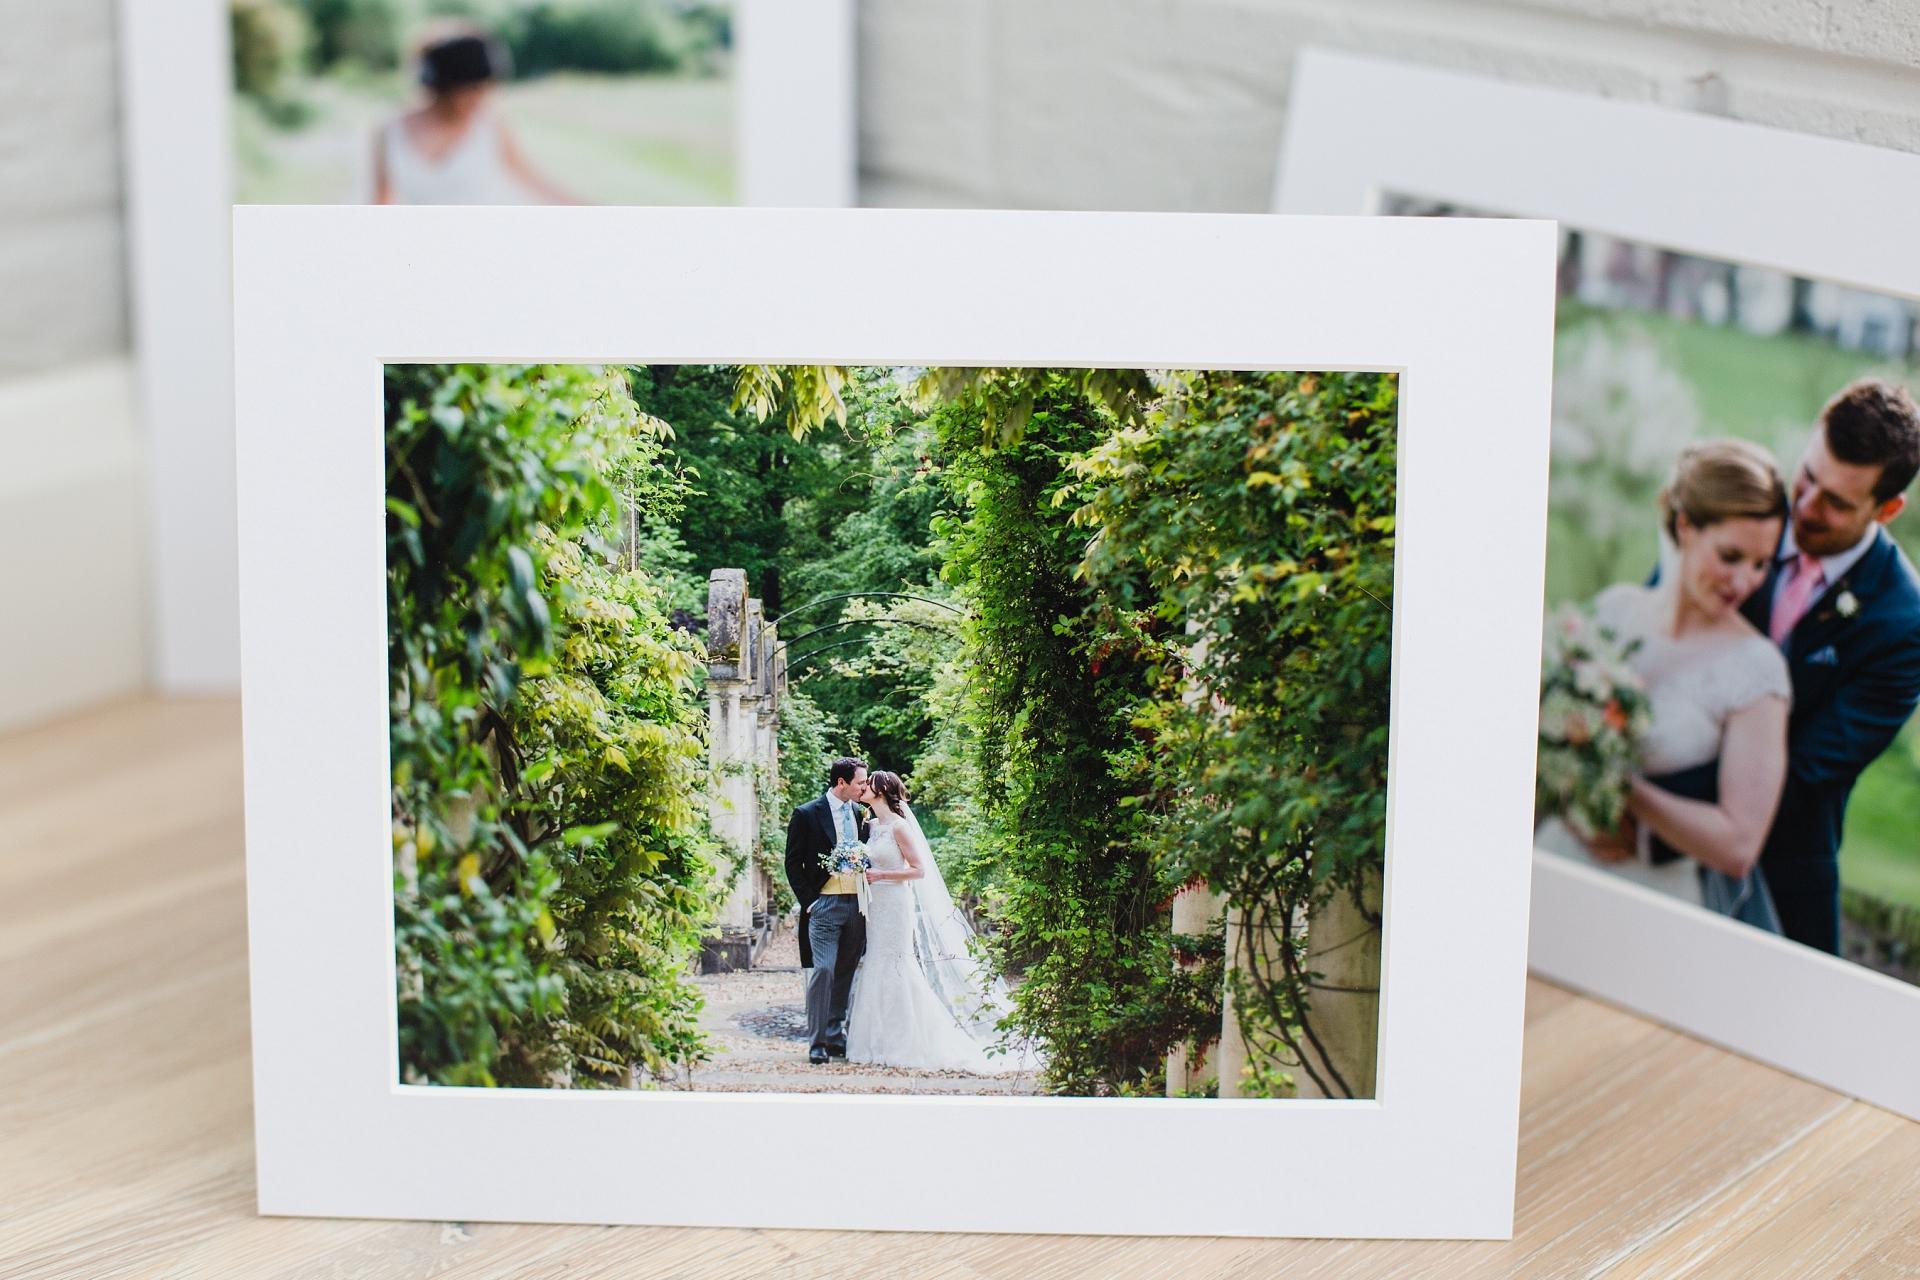 Printing your wedding photos